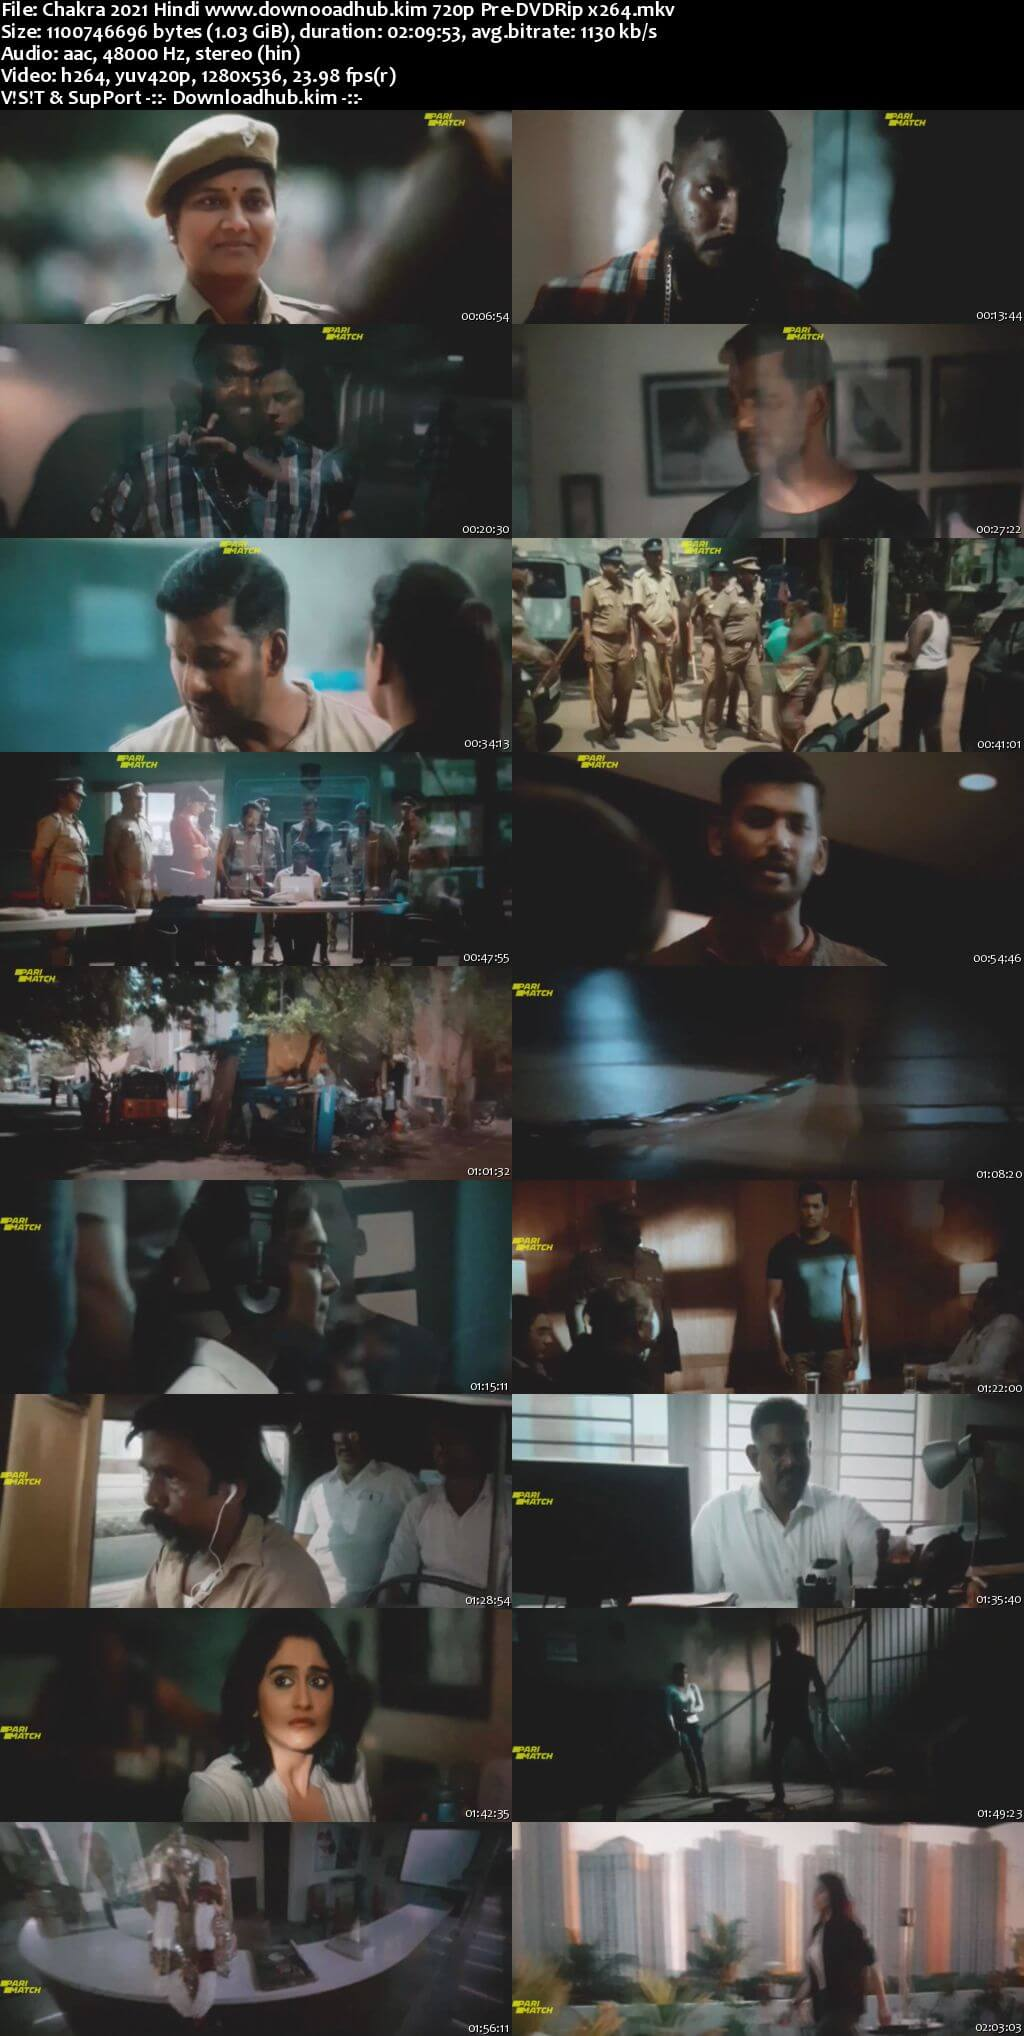 Chakra 2021 Hindi 720p 480p Pre-DVDRip x264